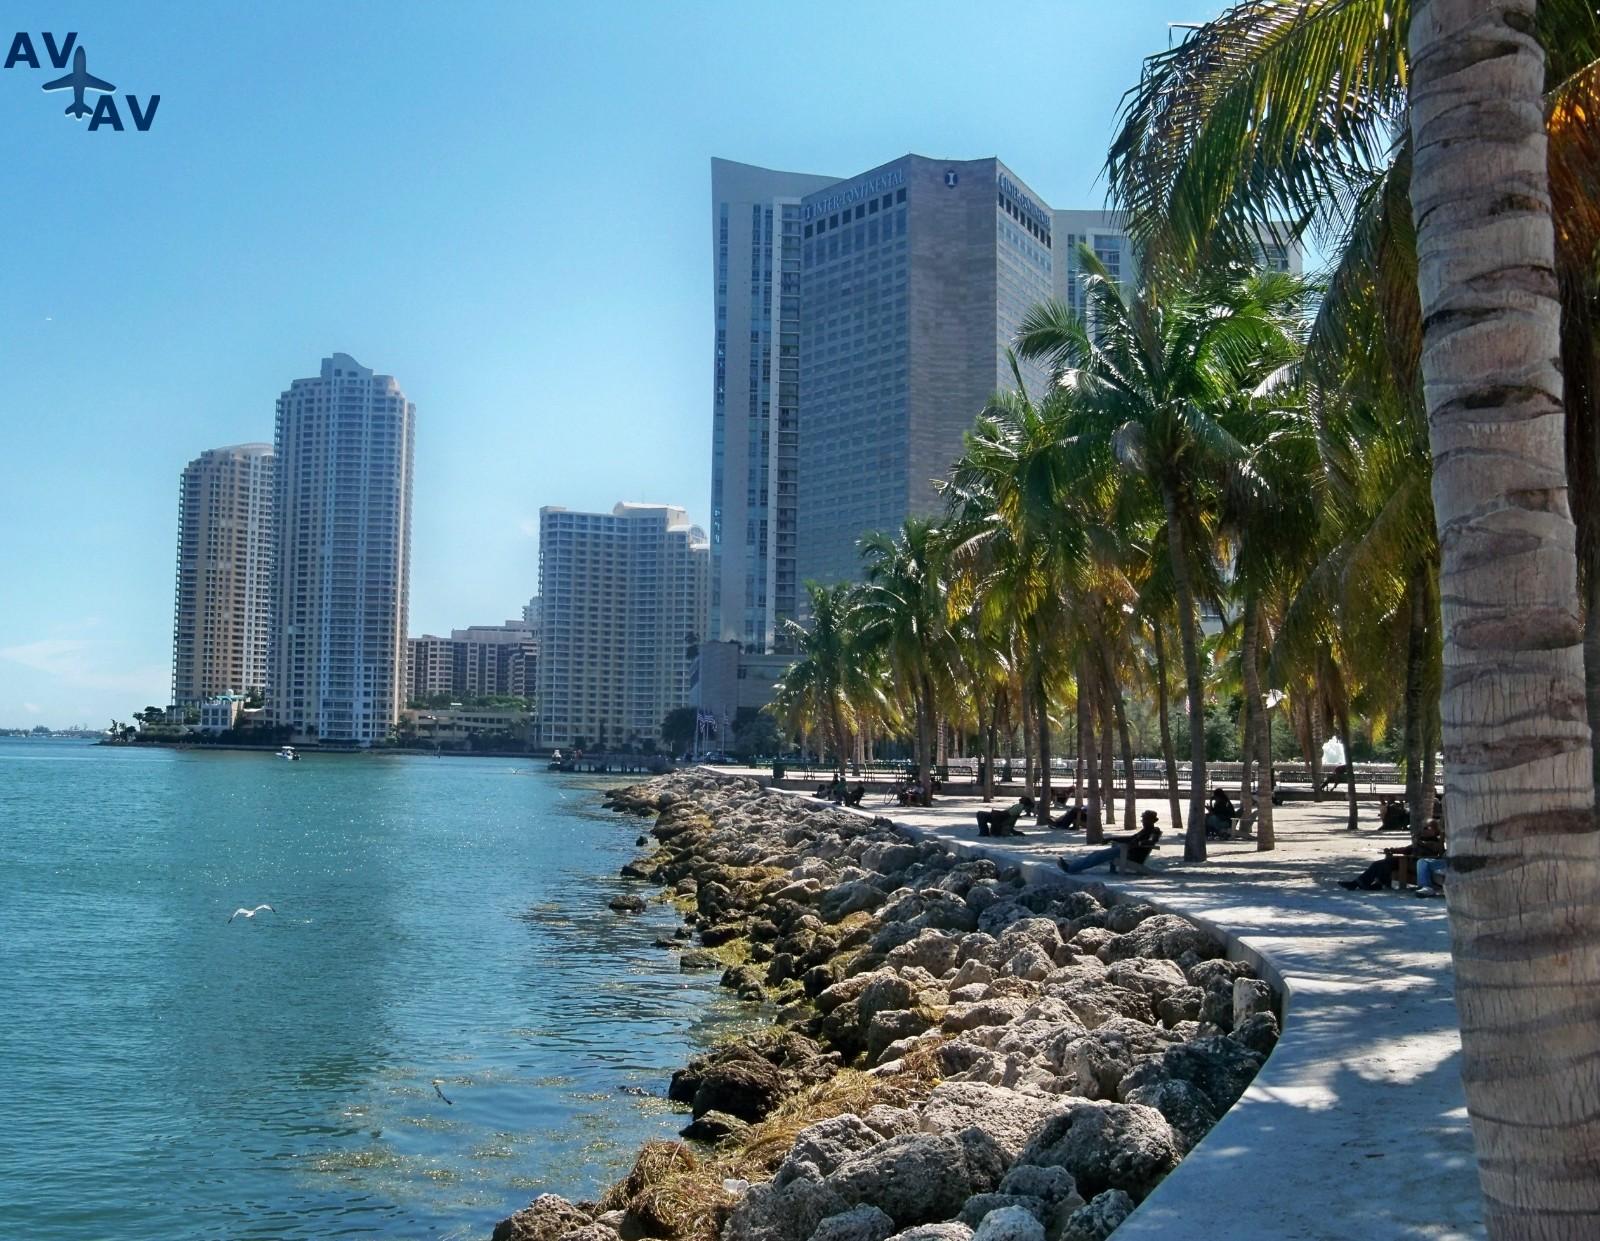 Nezabyivaemoe puteshestvie v Mayami - Незабываемое путешествие в Майами